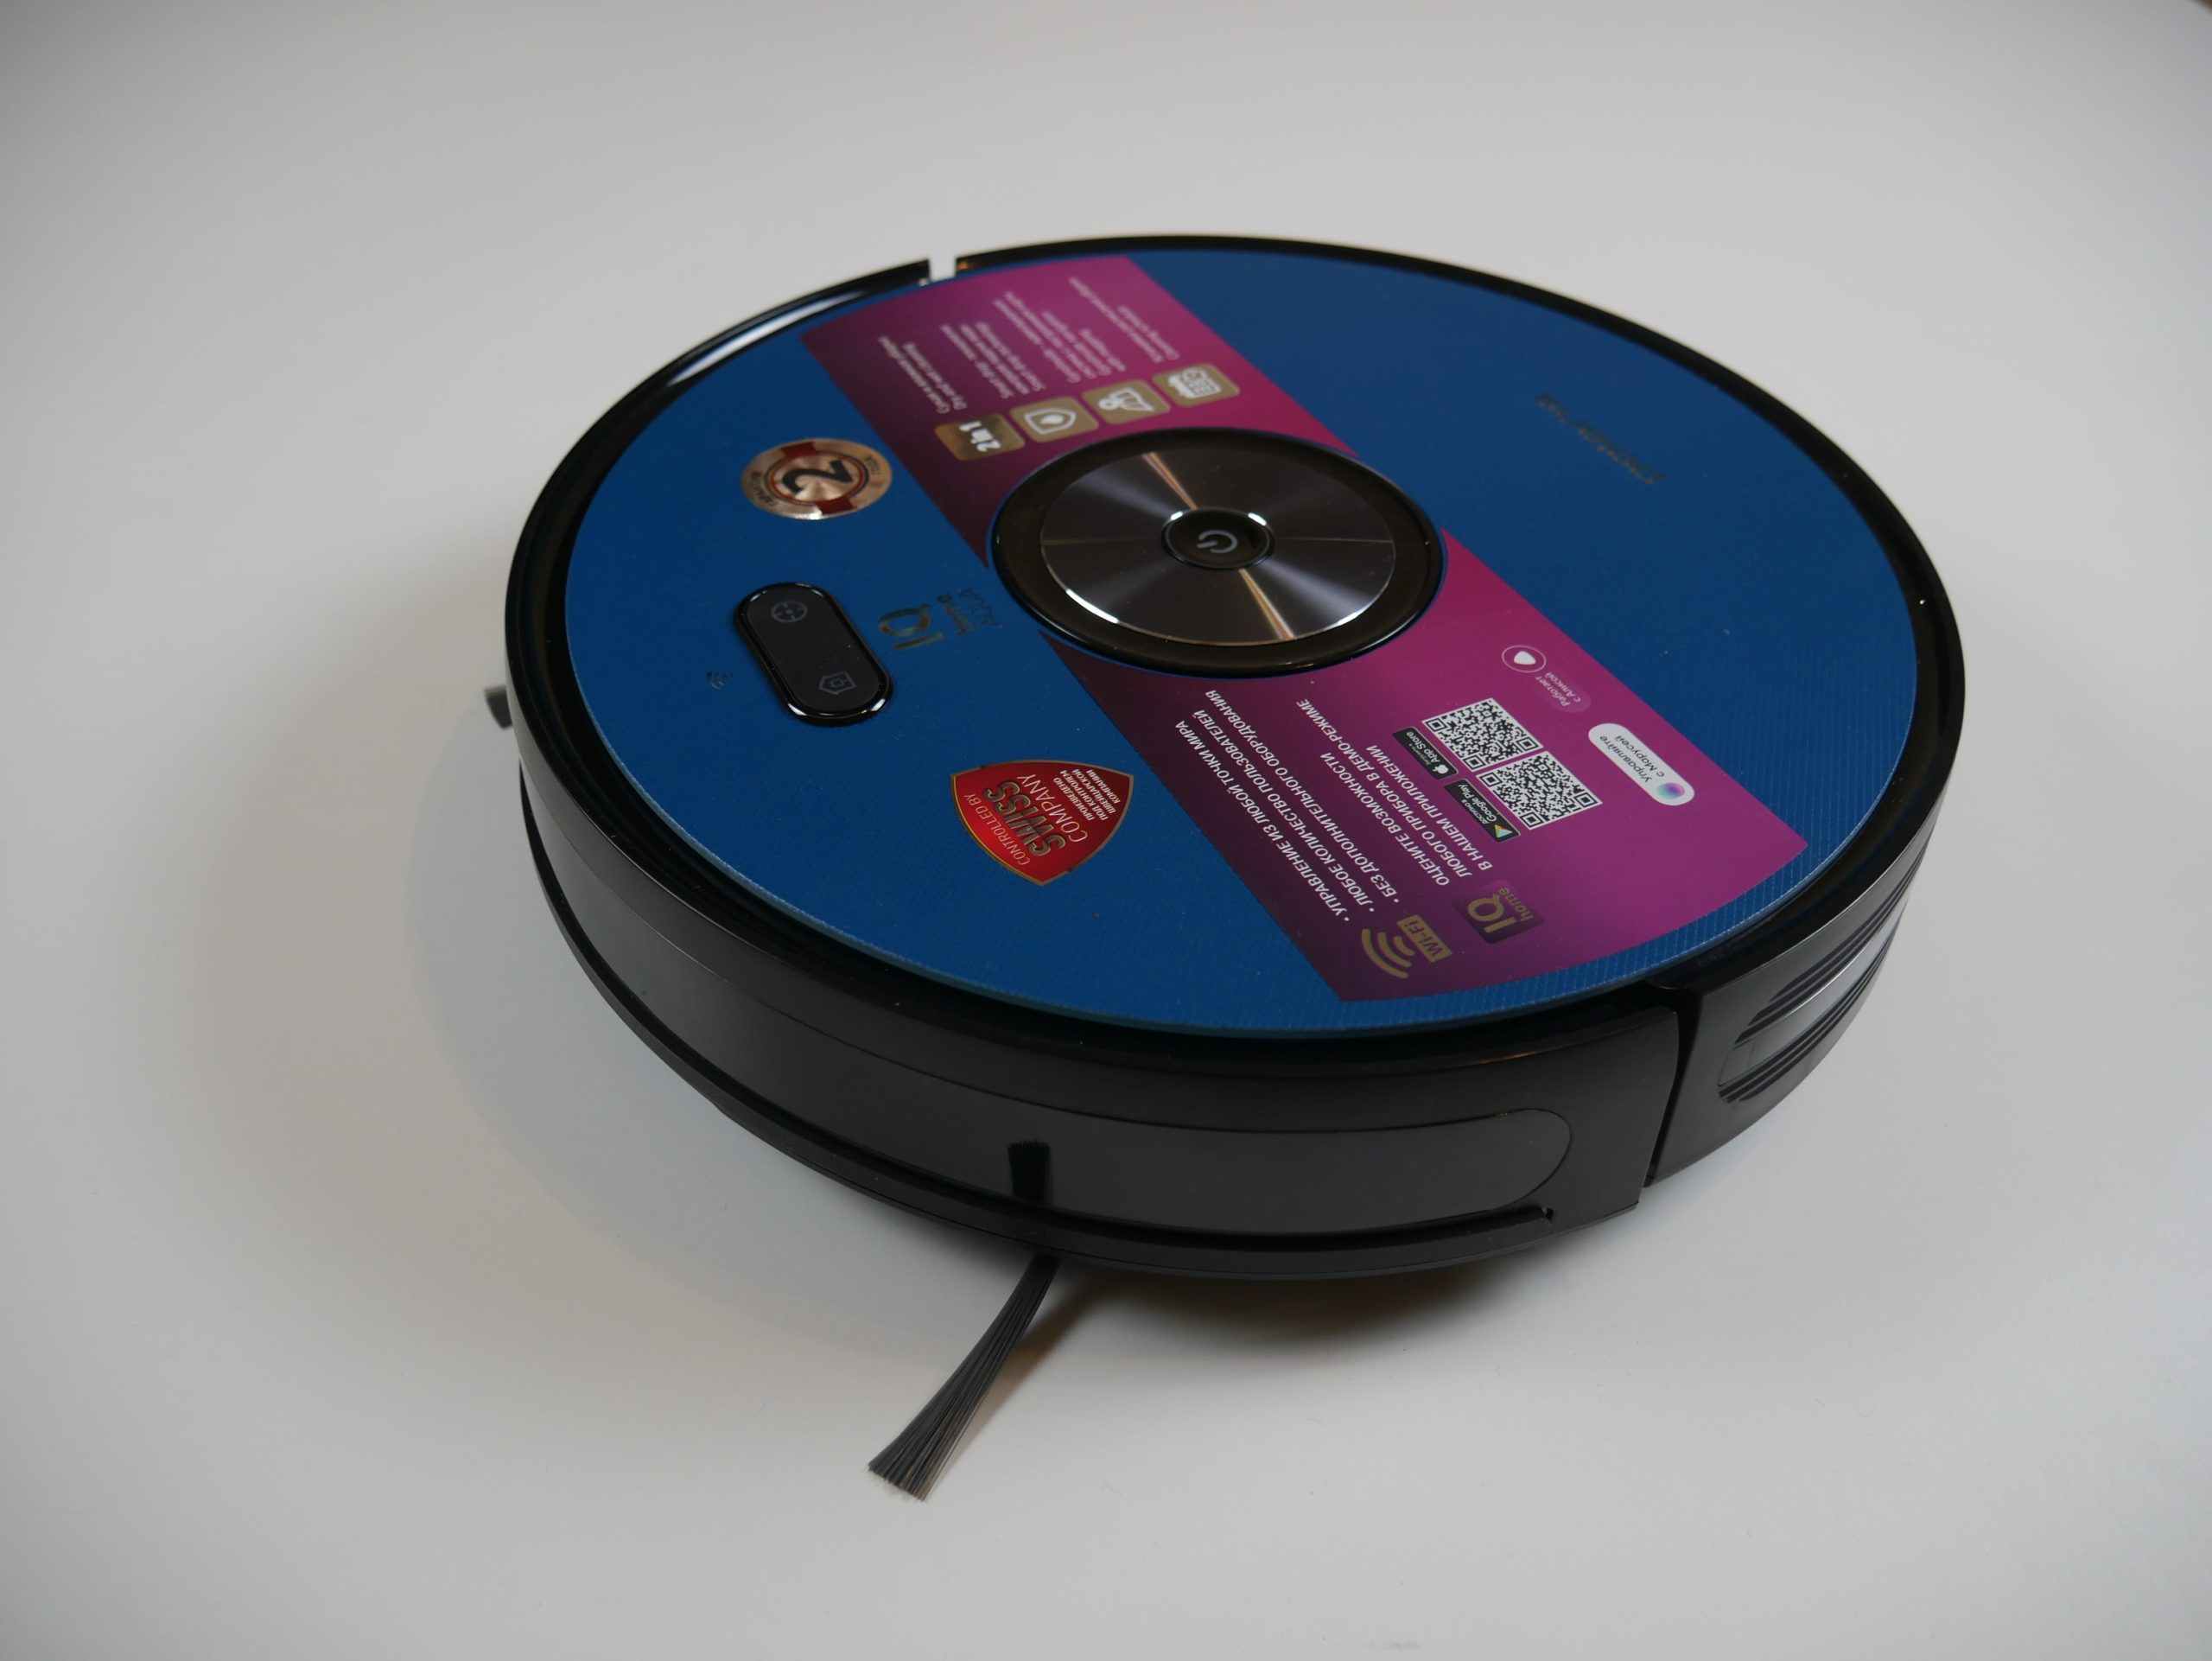 Polaris PVCR 3200 IQ Home Aqua вид тричетверти